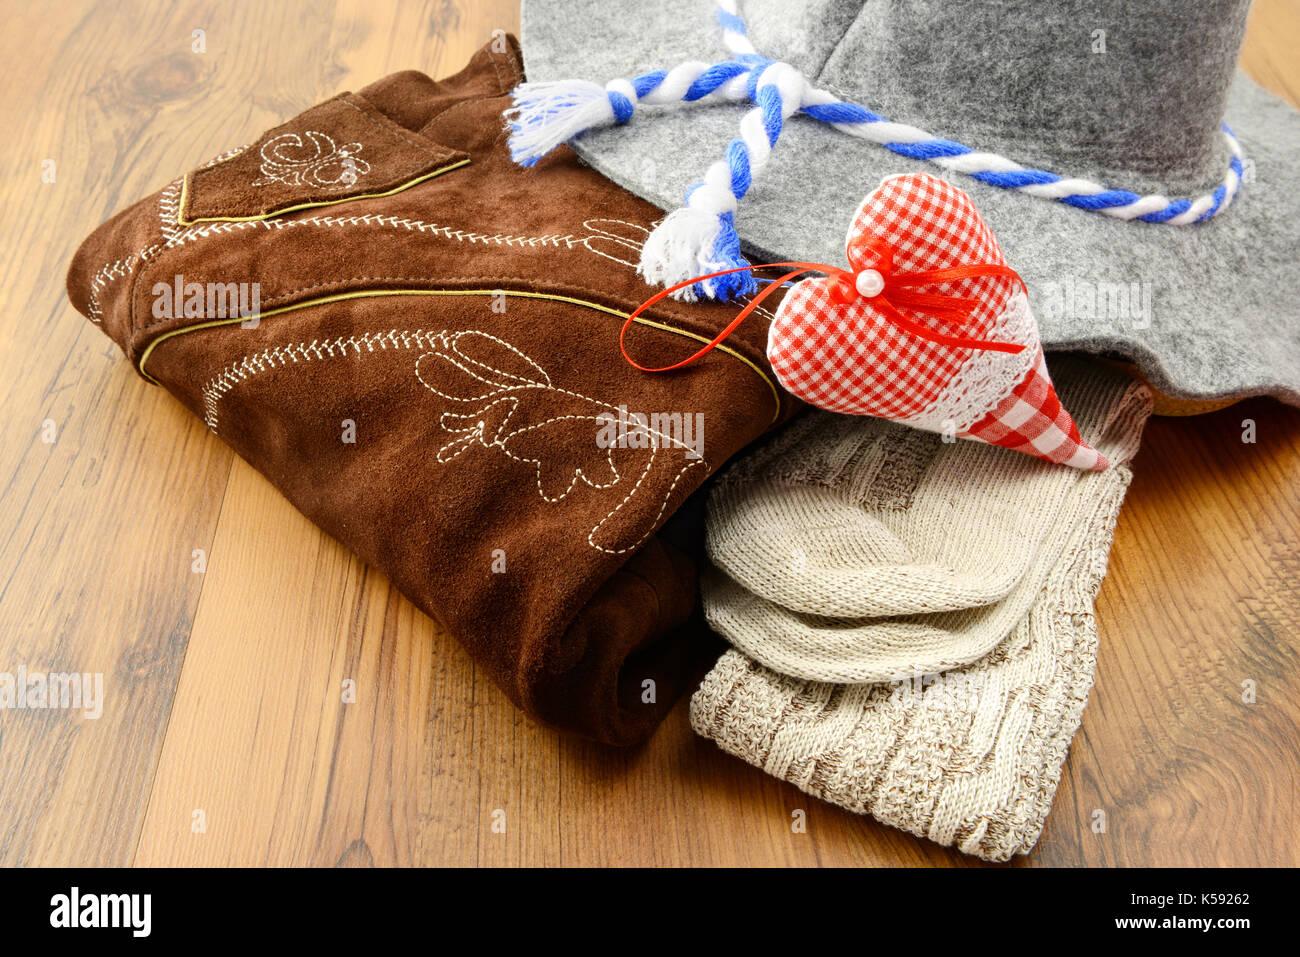 Oktoberfest cloths like lederhosen, felt hat and traditional socks on wooden table. store - Stock Image